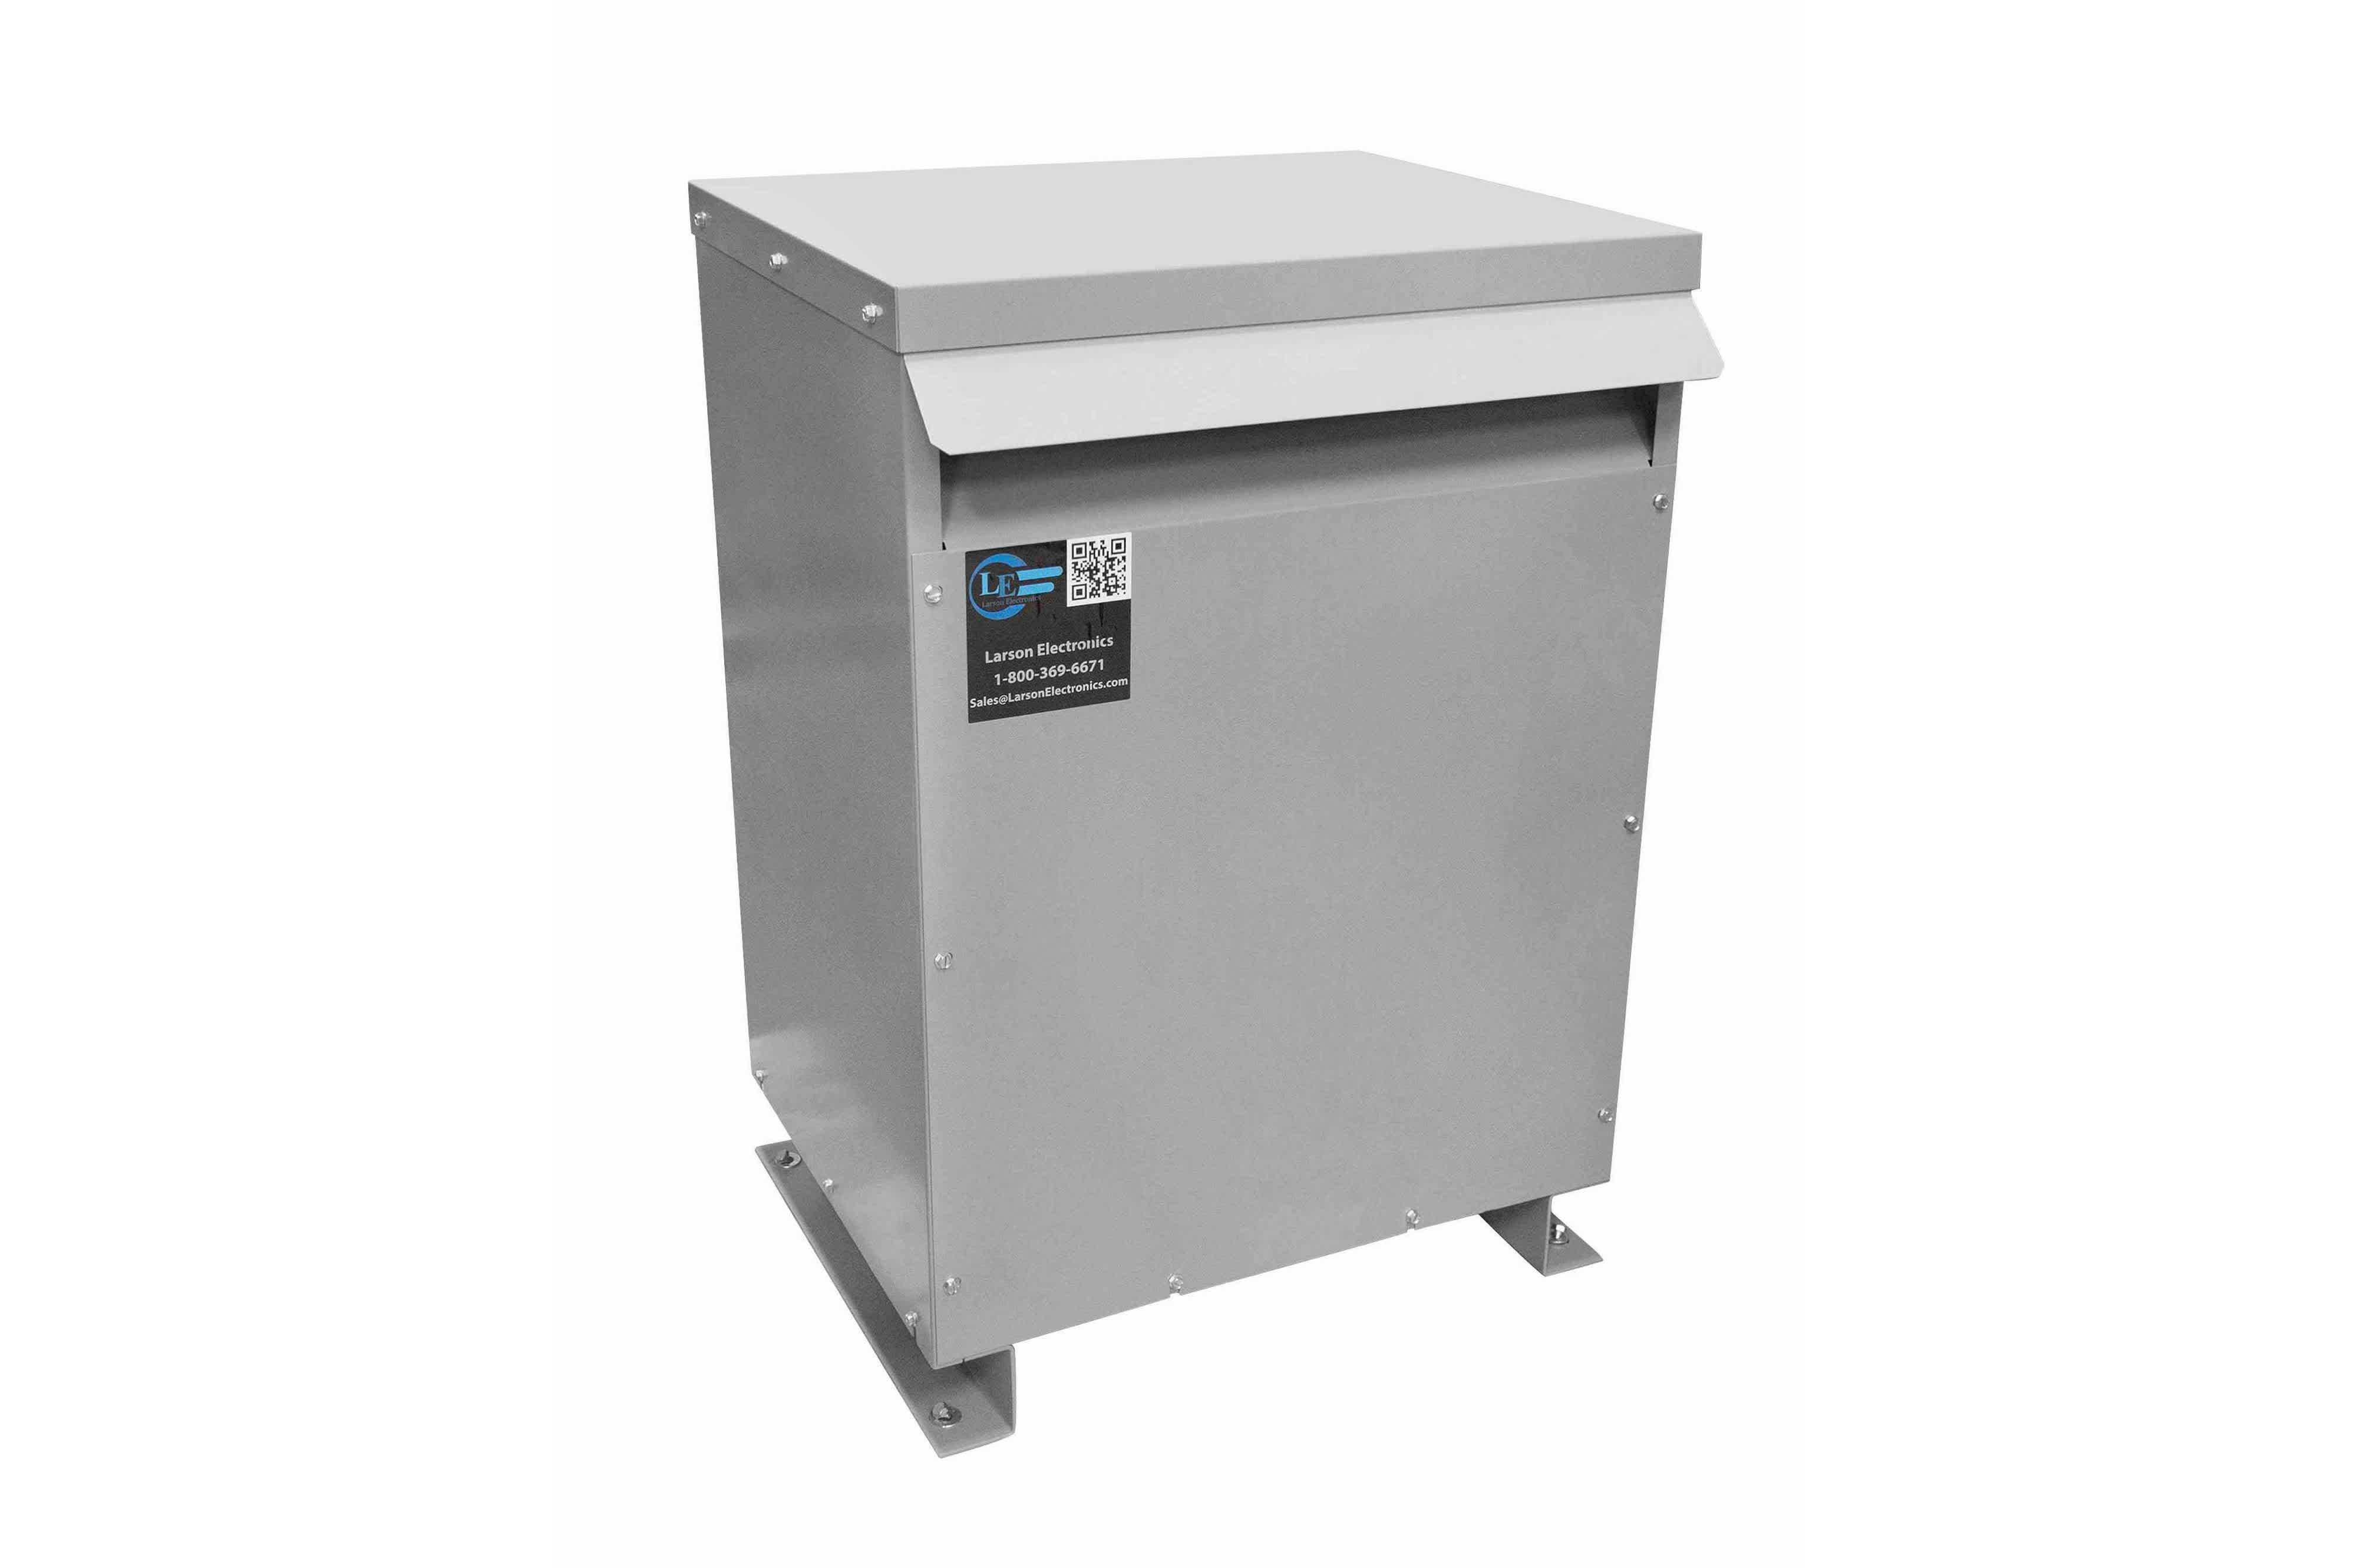 52.5 kVA 3PH Isolation Transformer, 380V Wye Primary, 600Y/347 Wye-N Secondary, N3R, Ventilated, 60 Hz